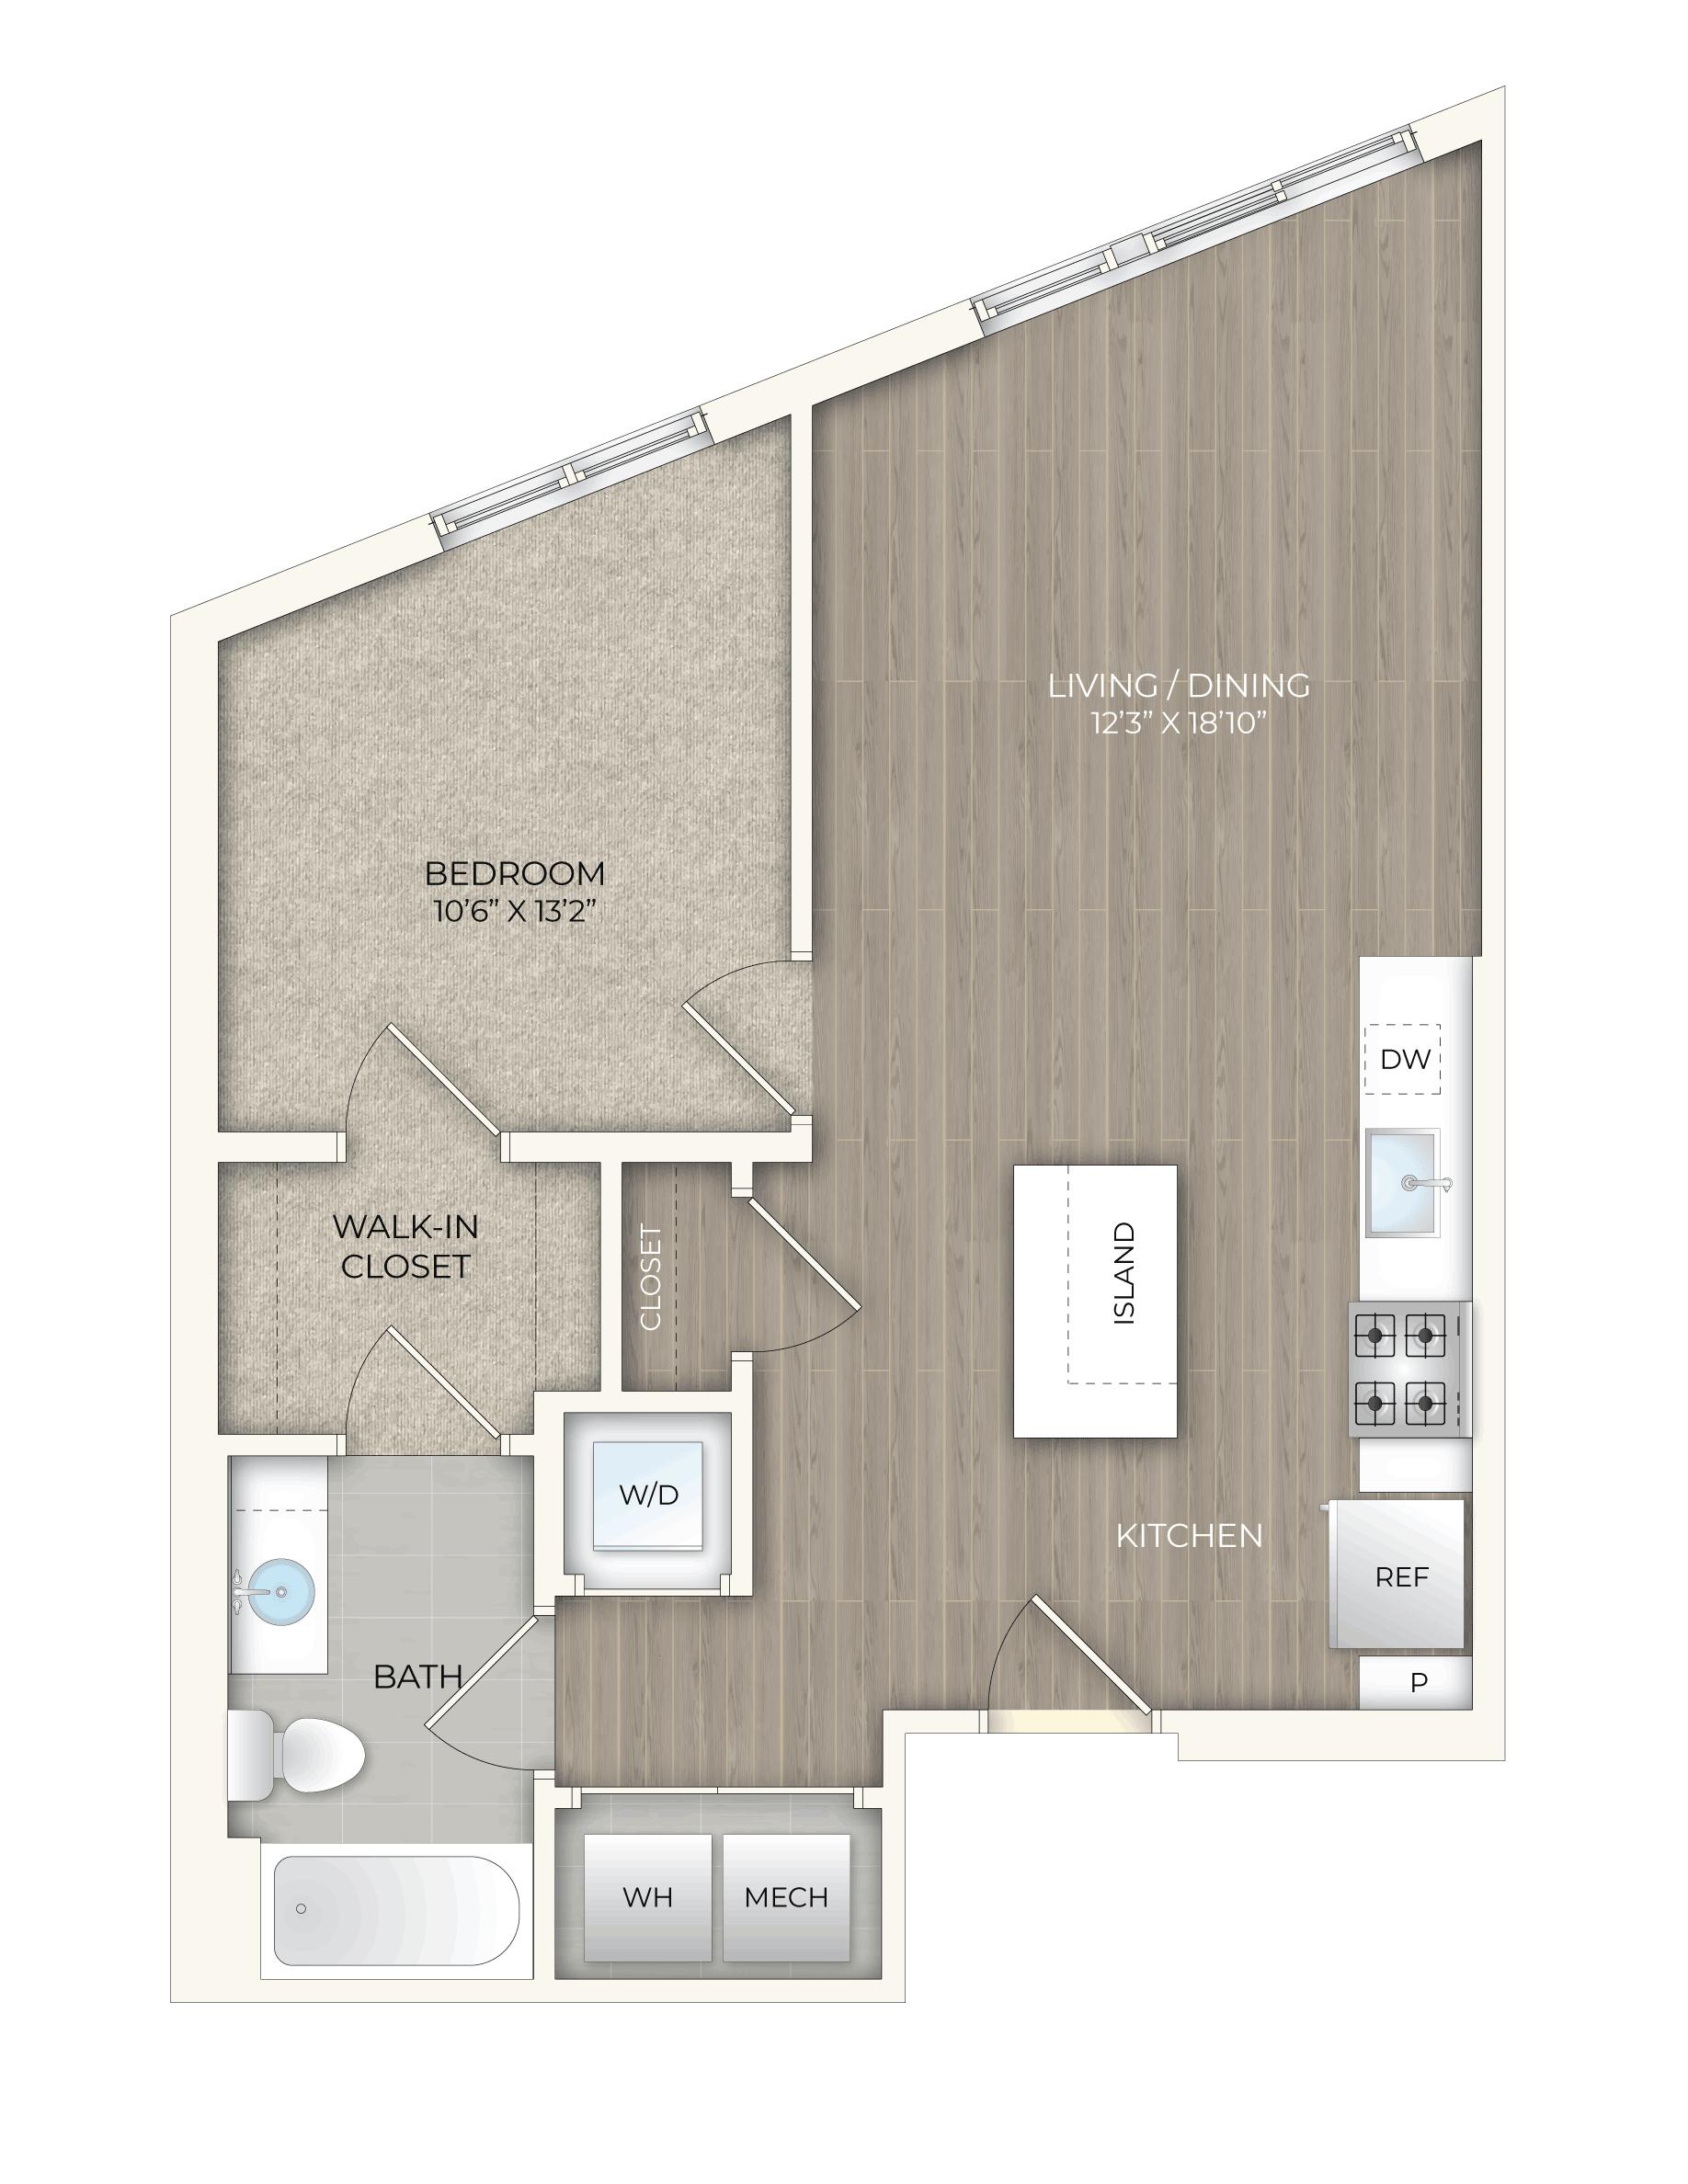 floor plan image of apartment 406S